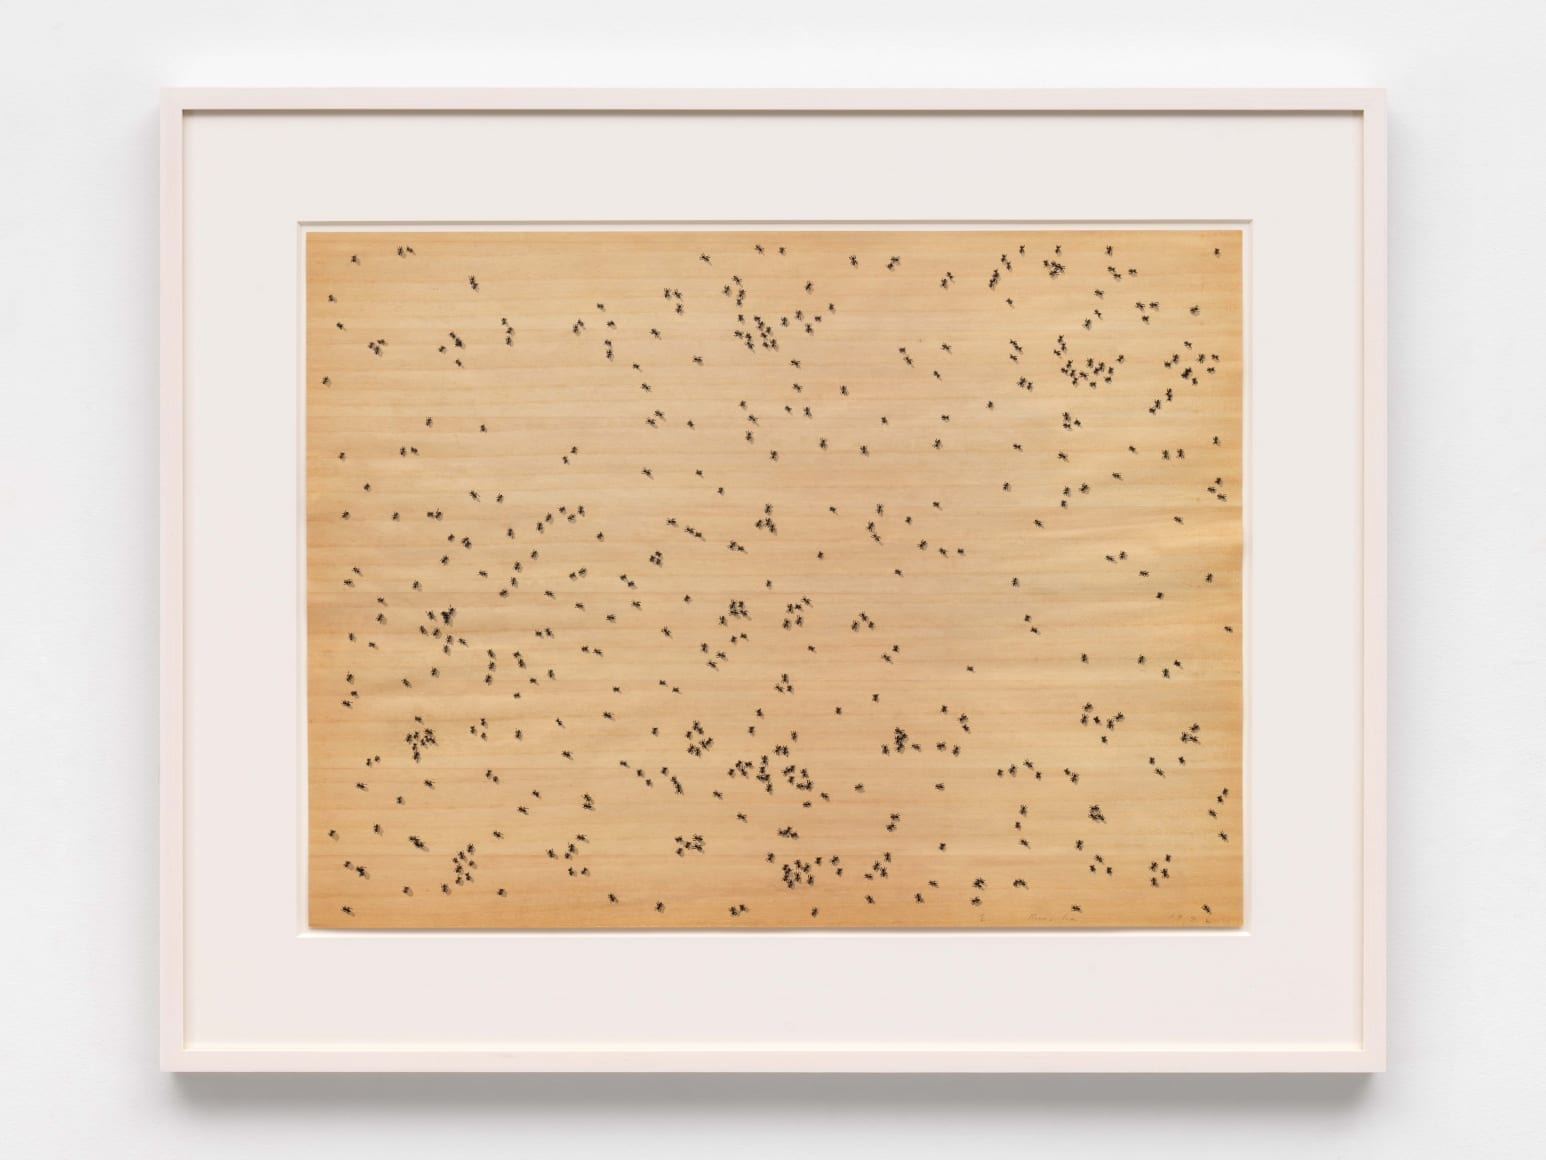 Insects, 1972 Medium: The complete portfolio of six screenprints